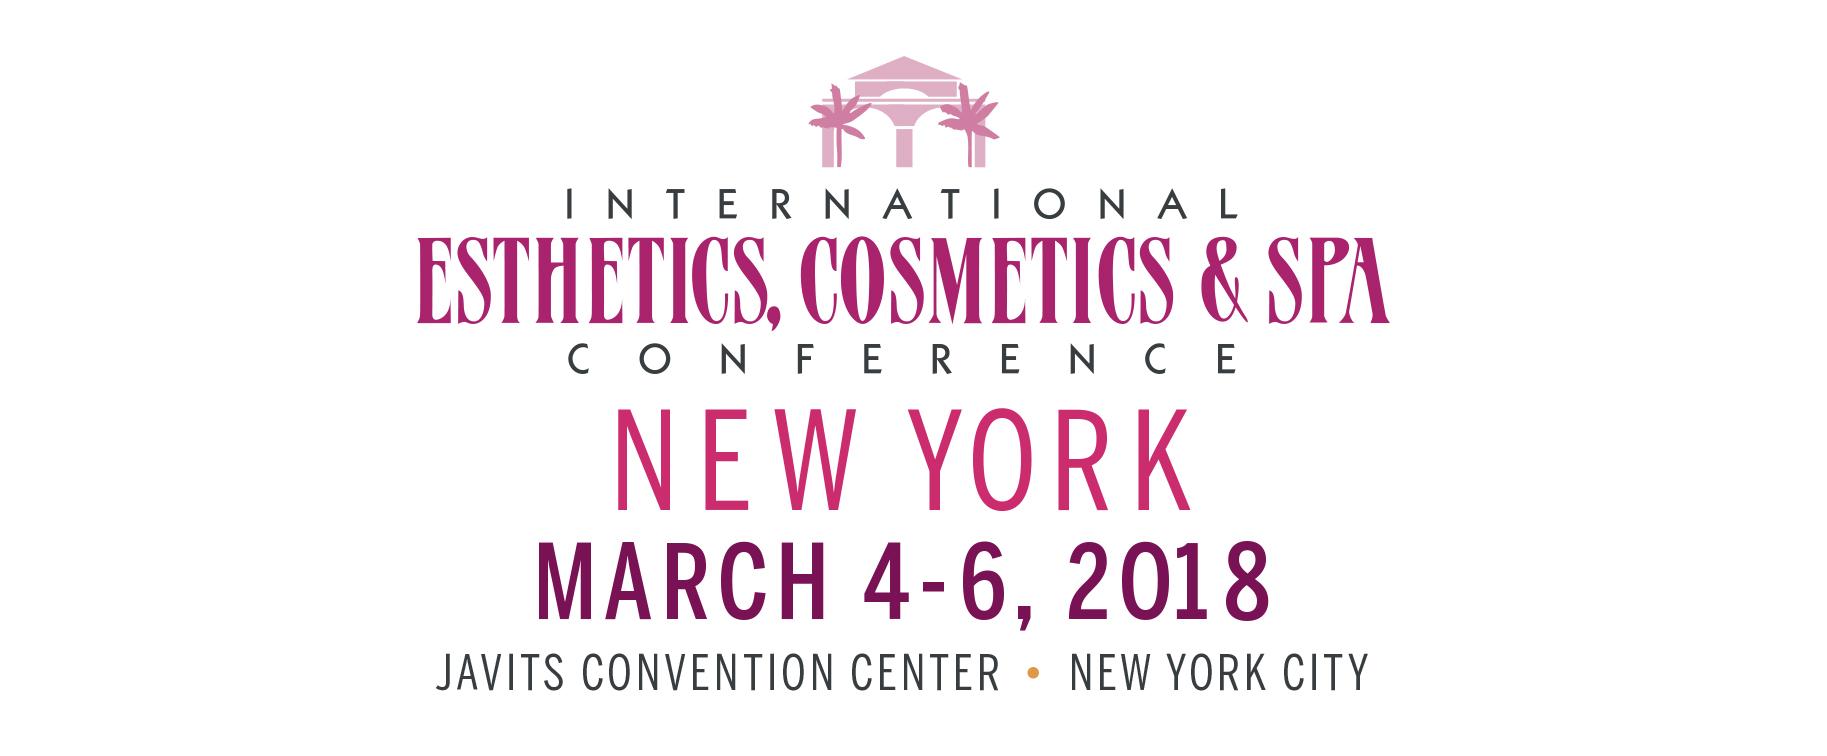 International Esthetics, Cosmetics & Spa Conference New York 2018